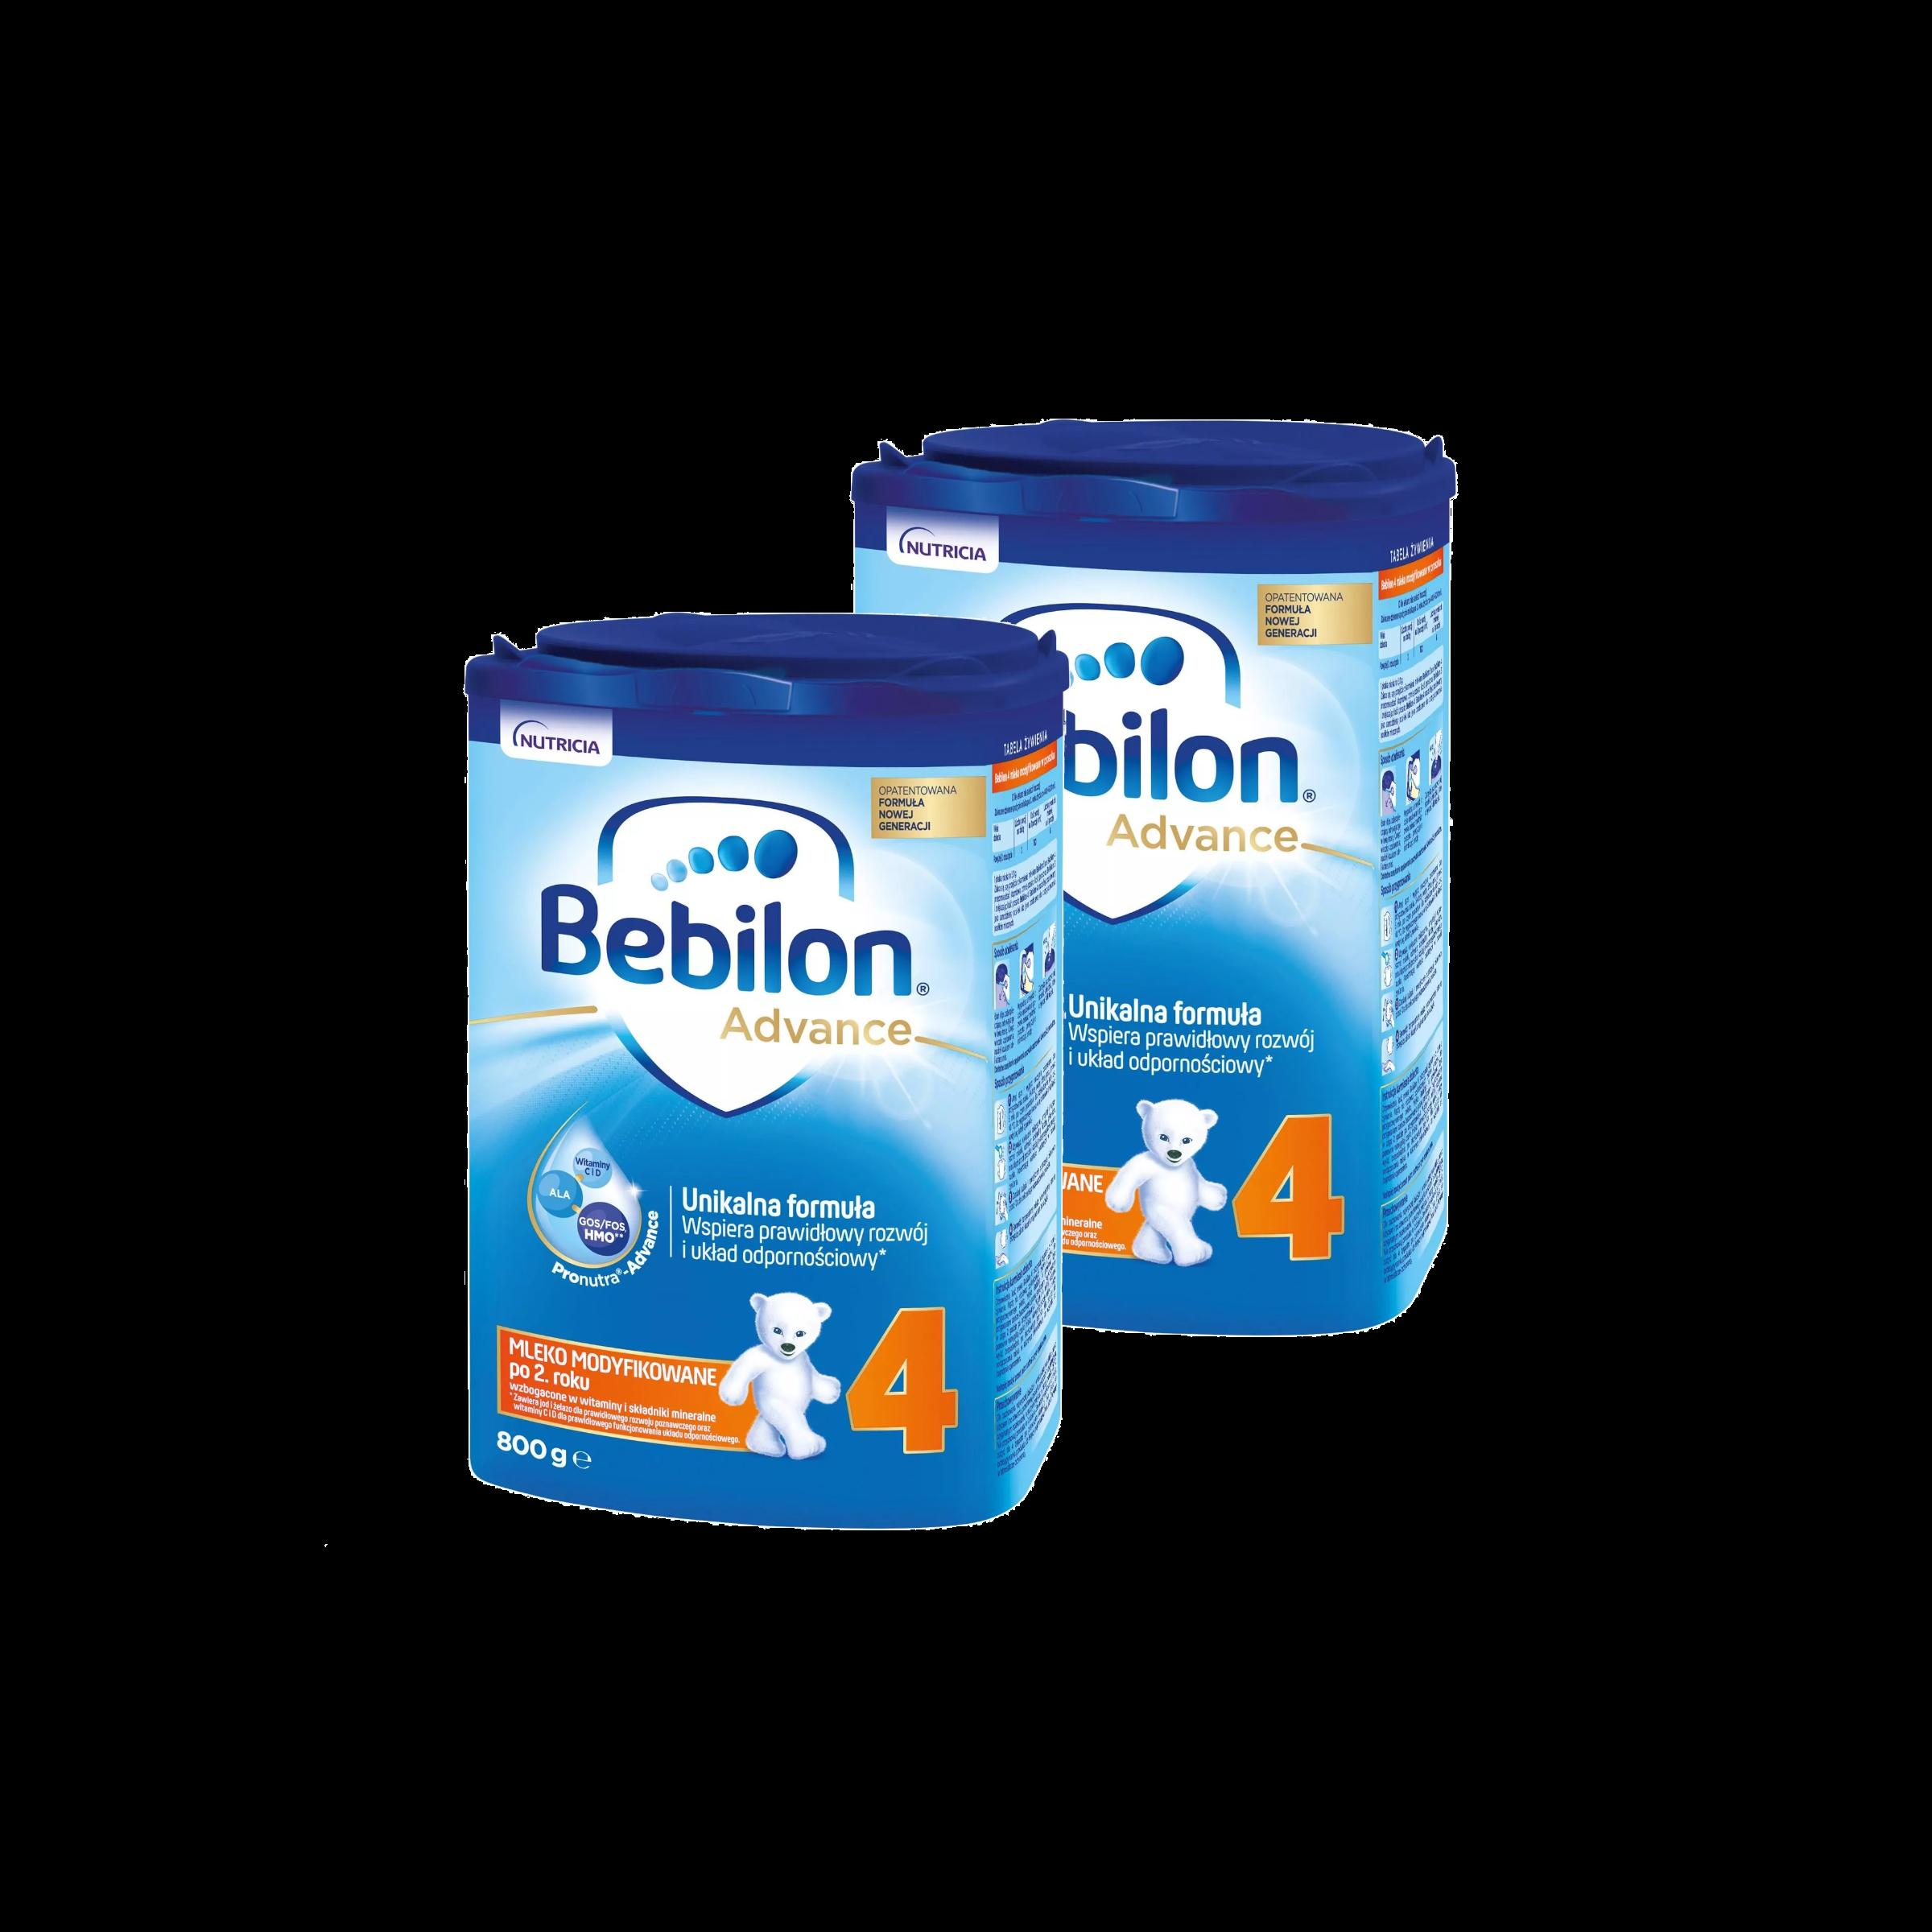 bebilon4_800_2pak